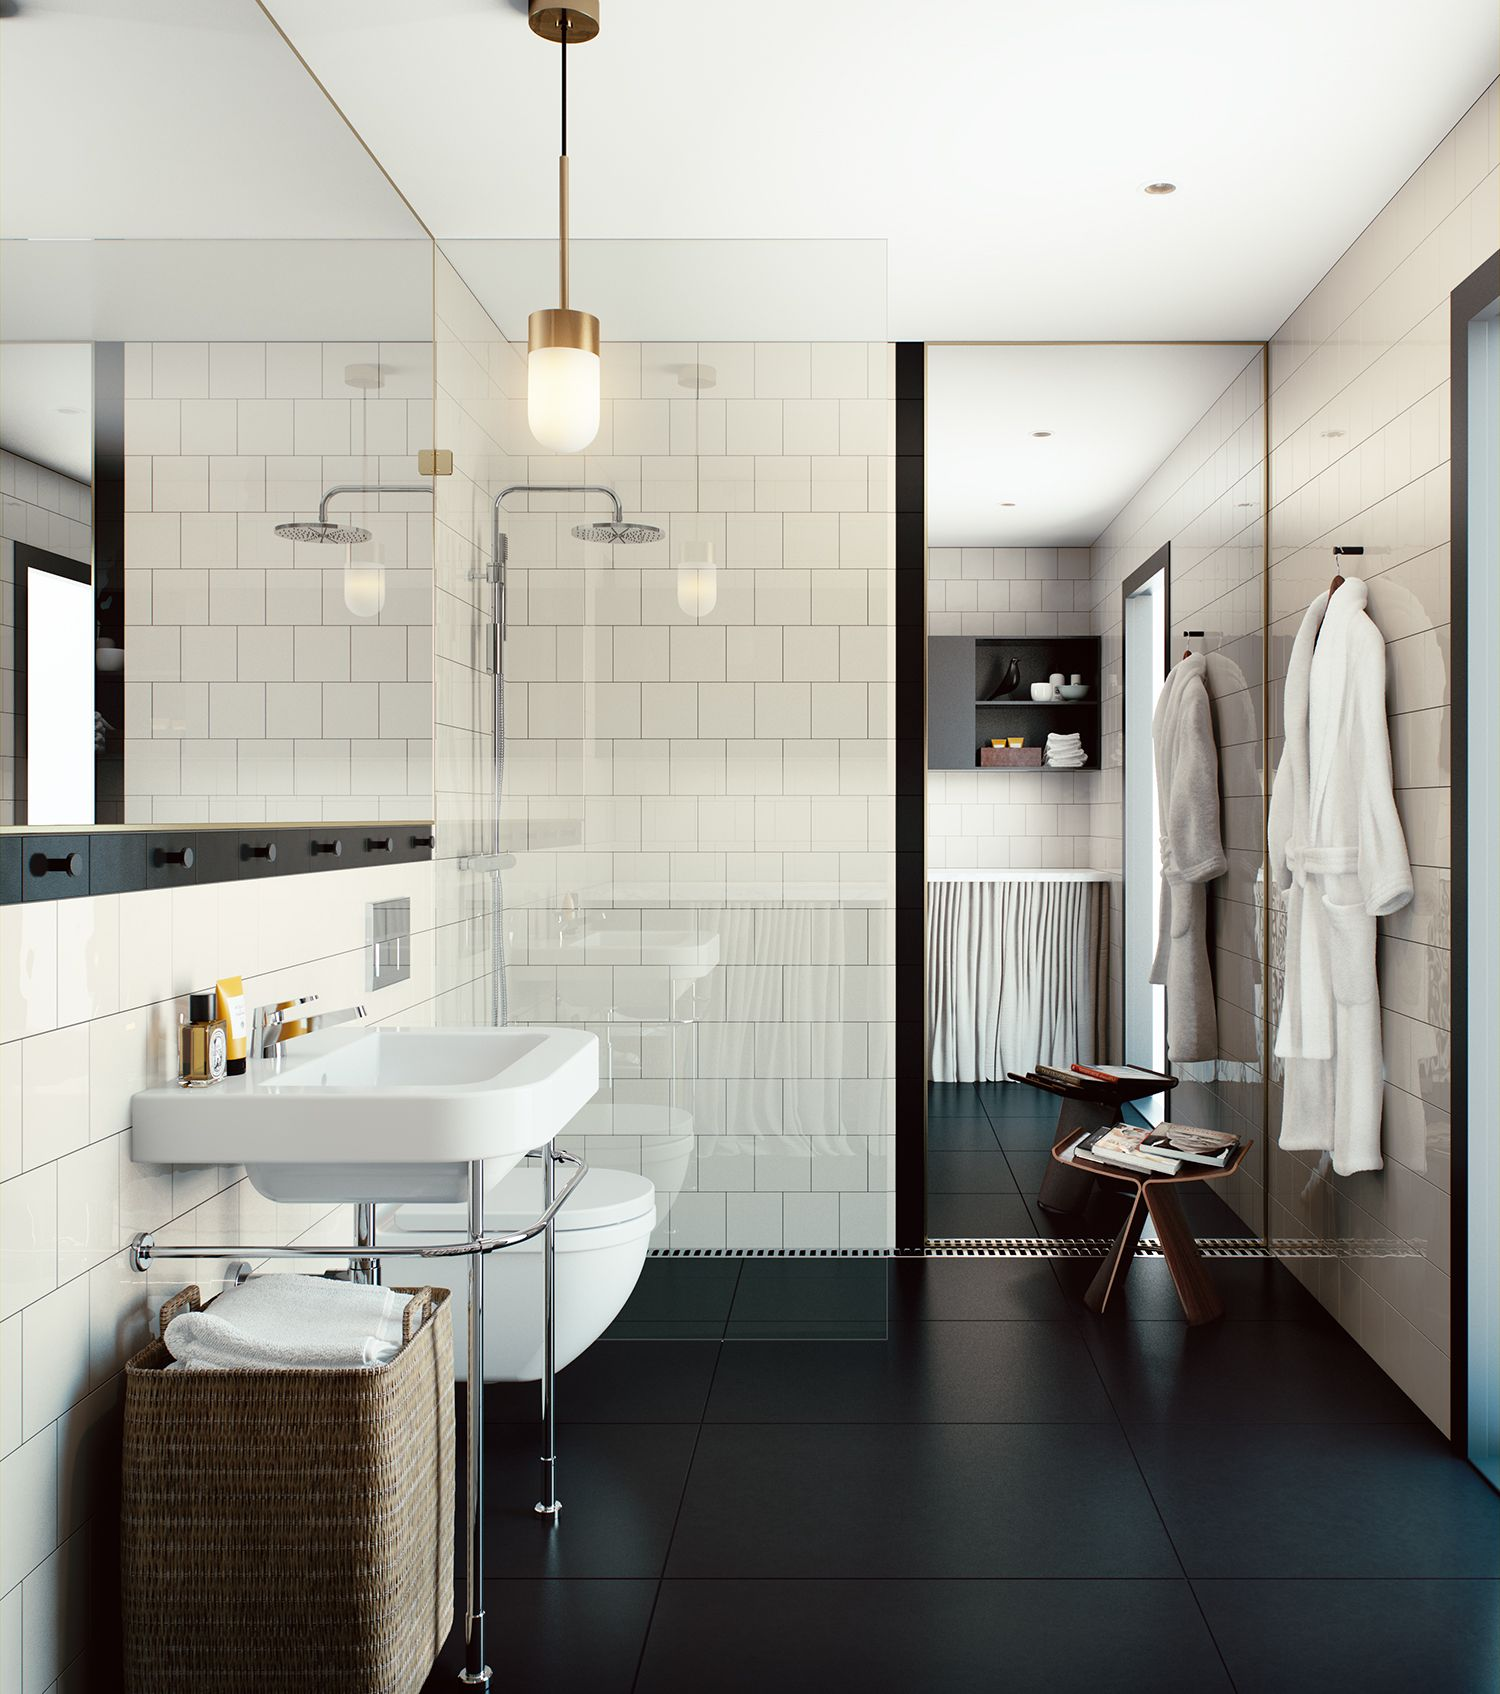 Salle De Bain Simple Et Moderne ~ clean and simple spanish style bath with modern bent pinterest